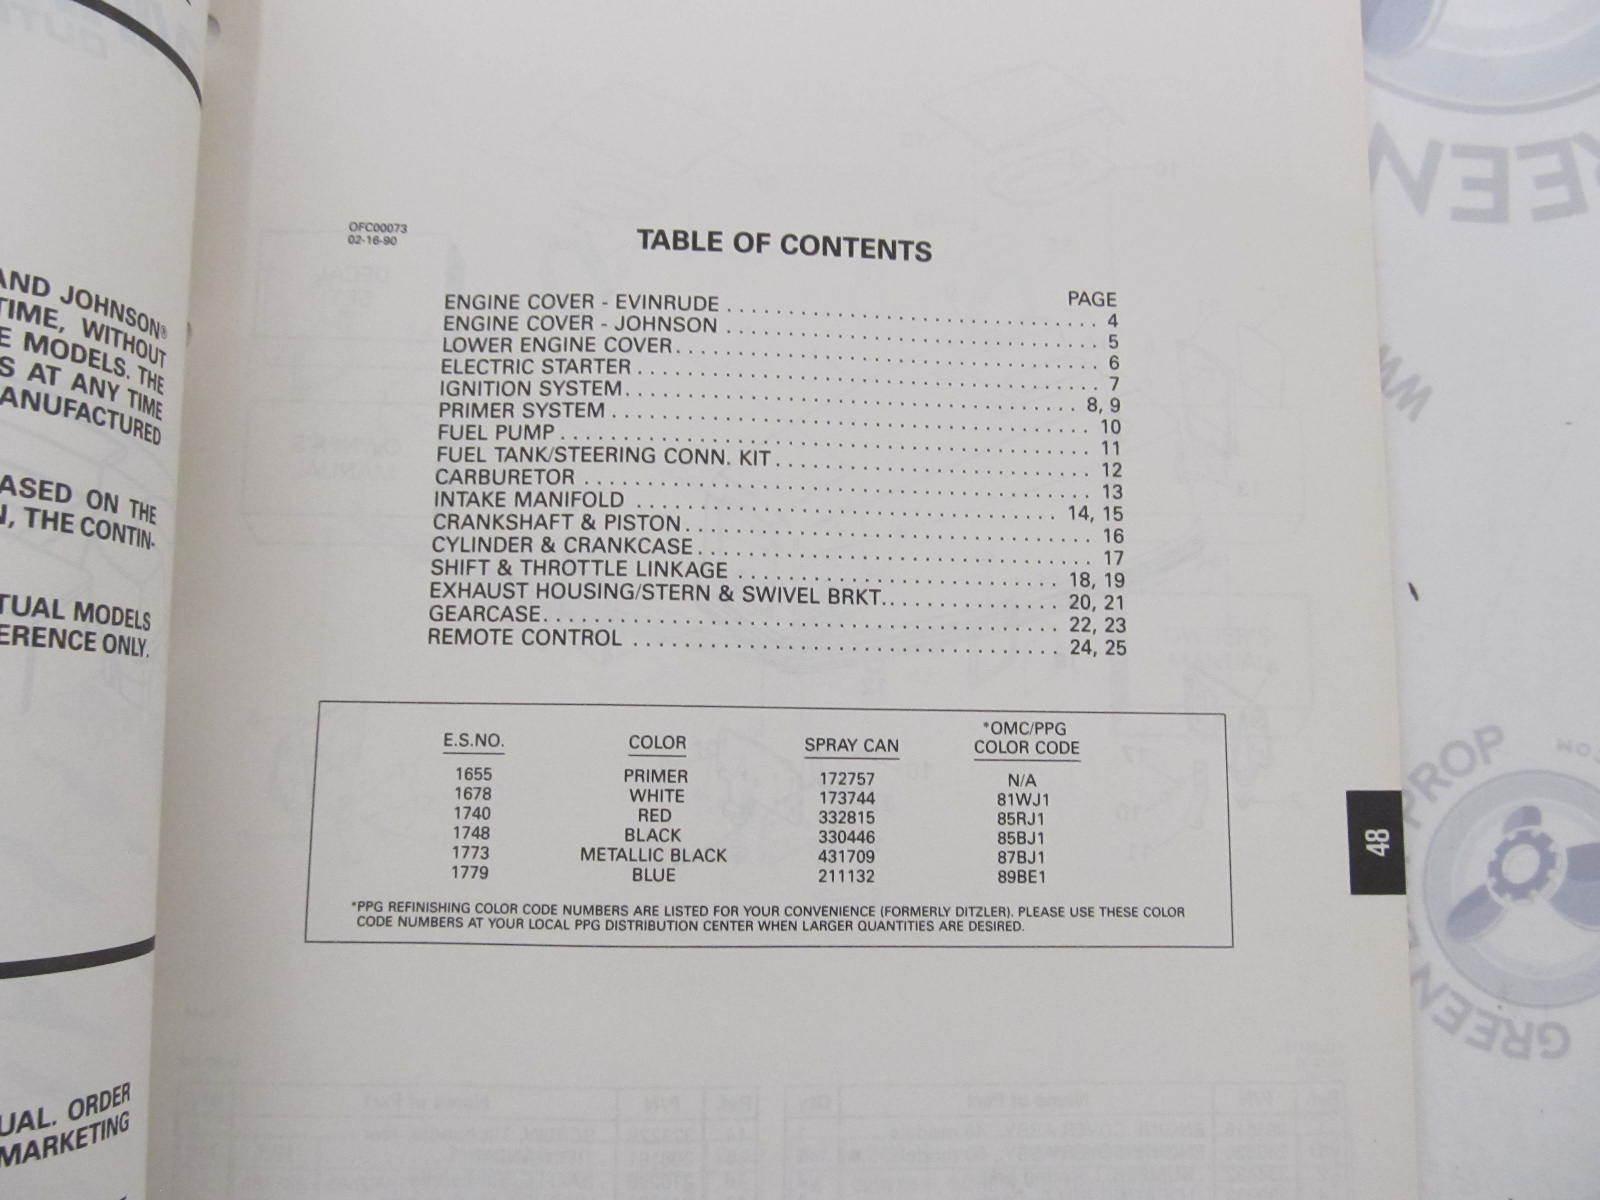 433788 1990 OMC Evinrude Johnson Outboard Parts Catalog 48-50 HP